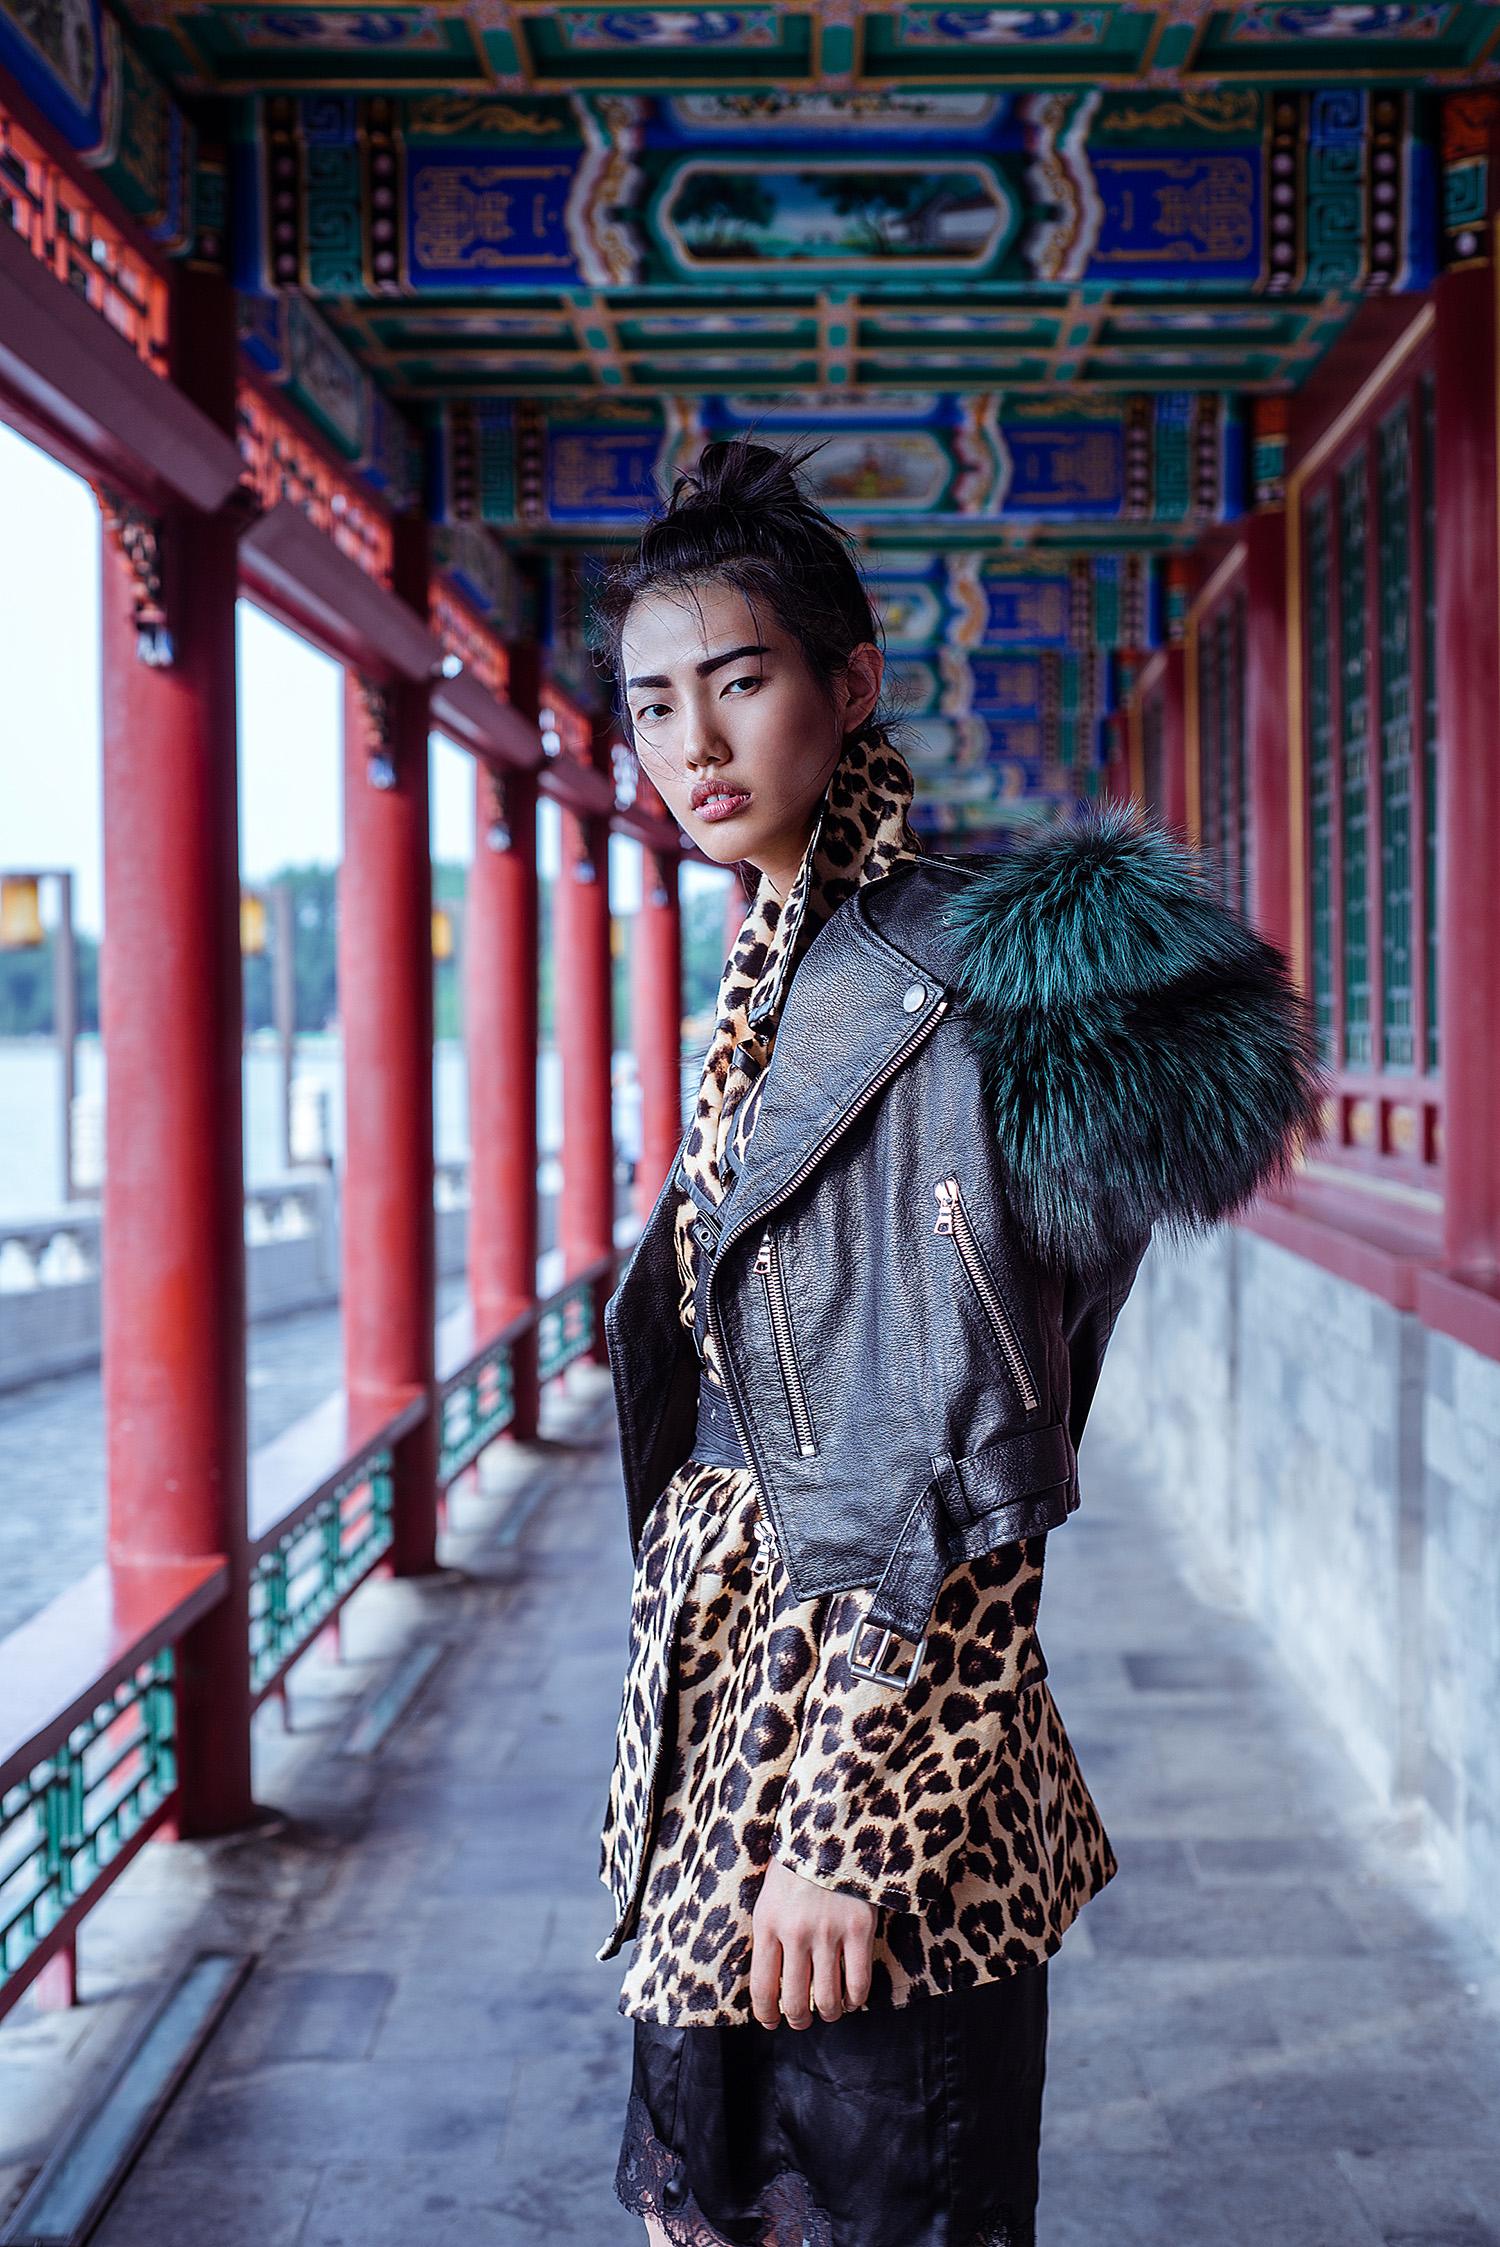 Cosmopolitan (Hong Kong)